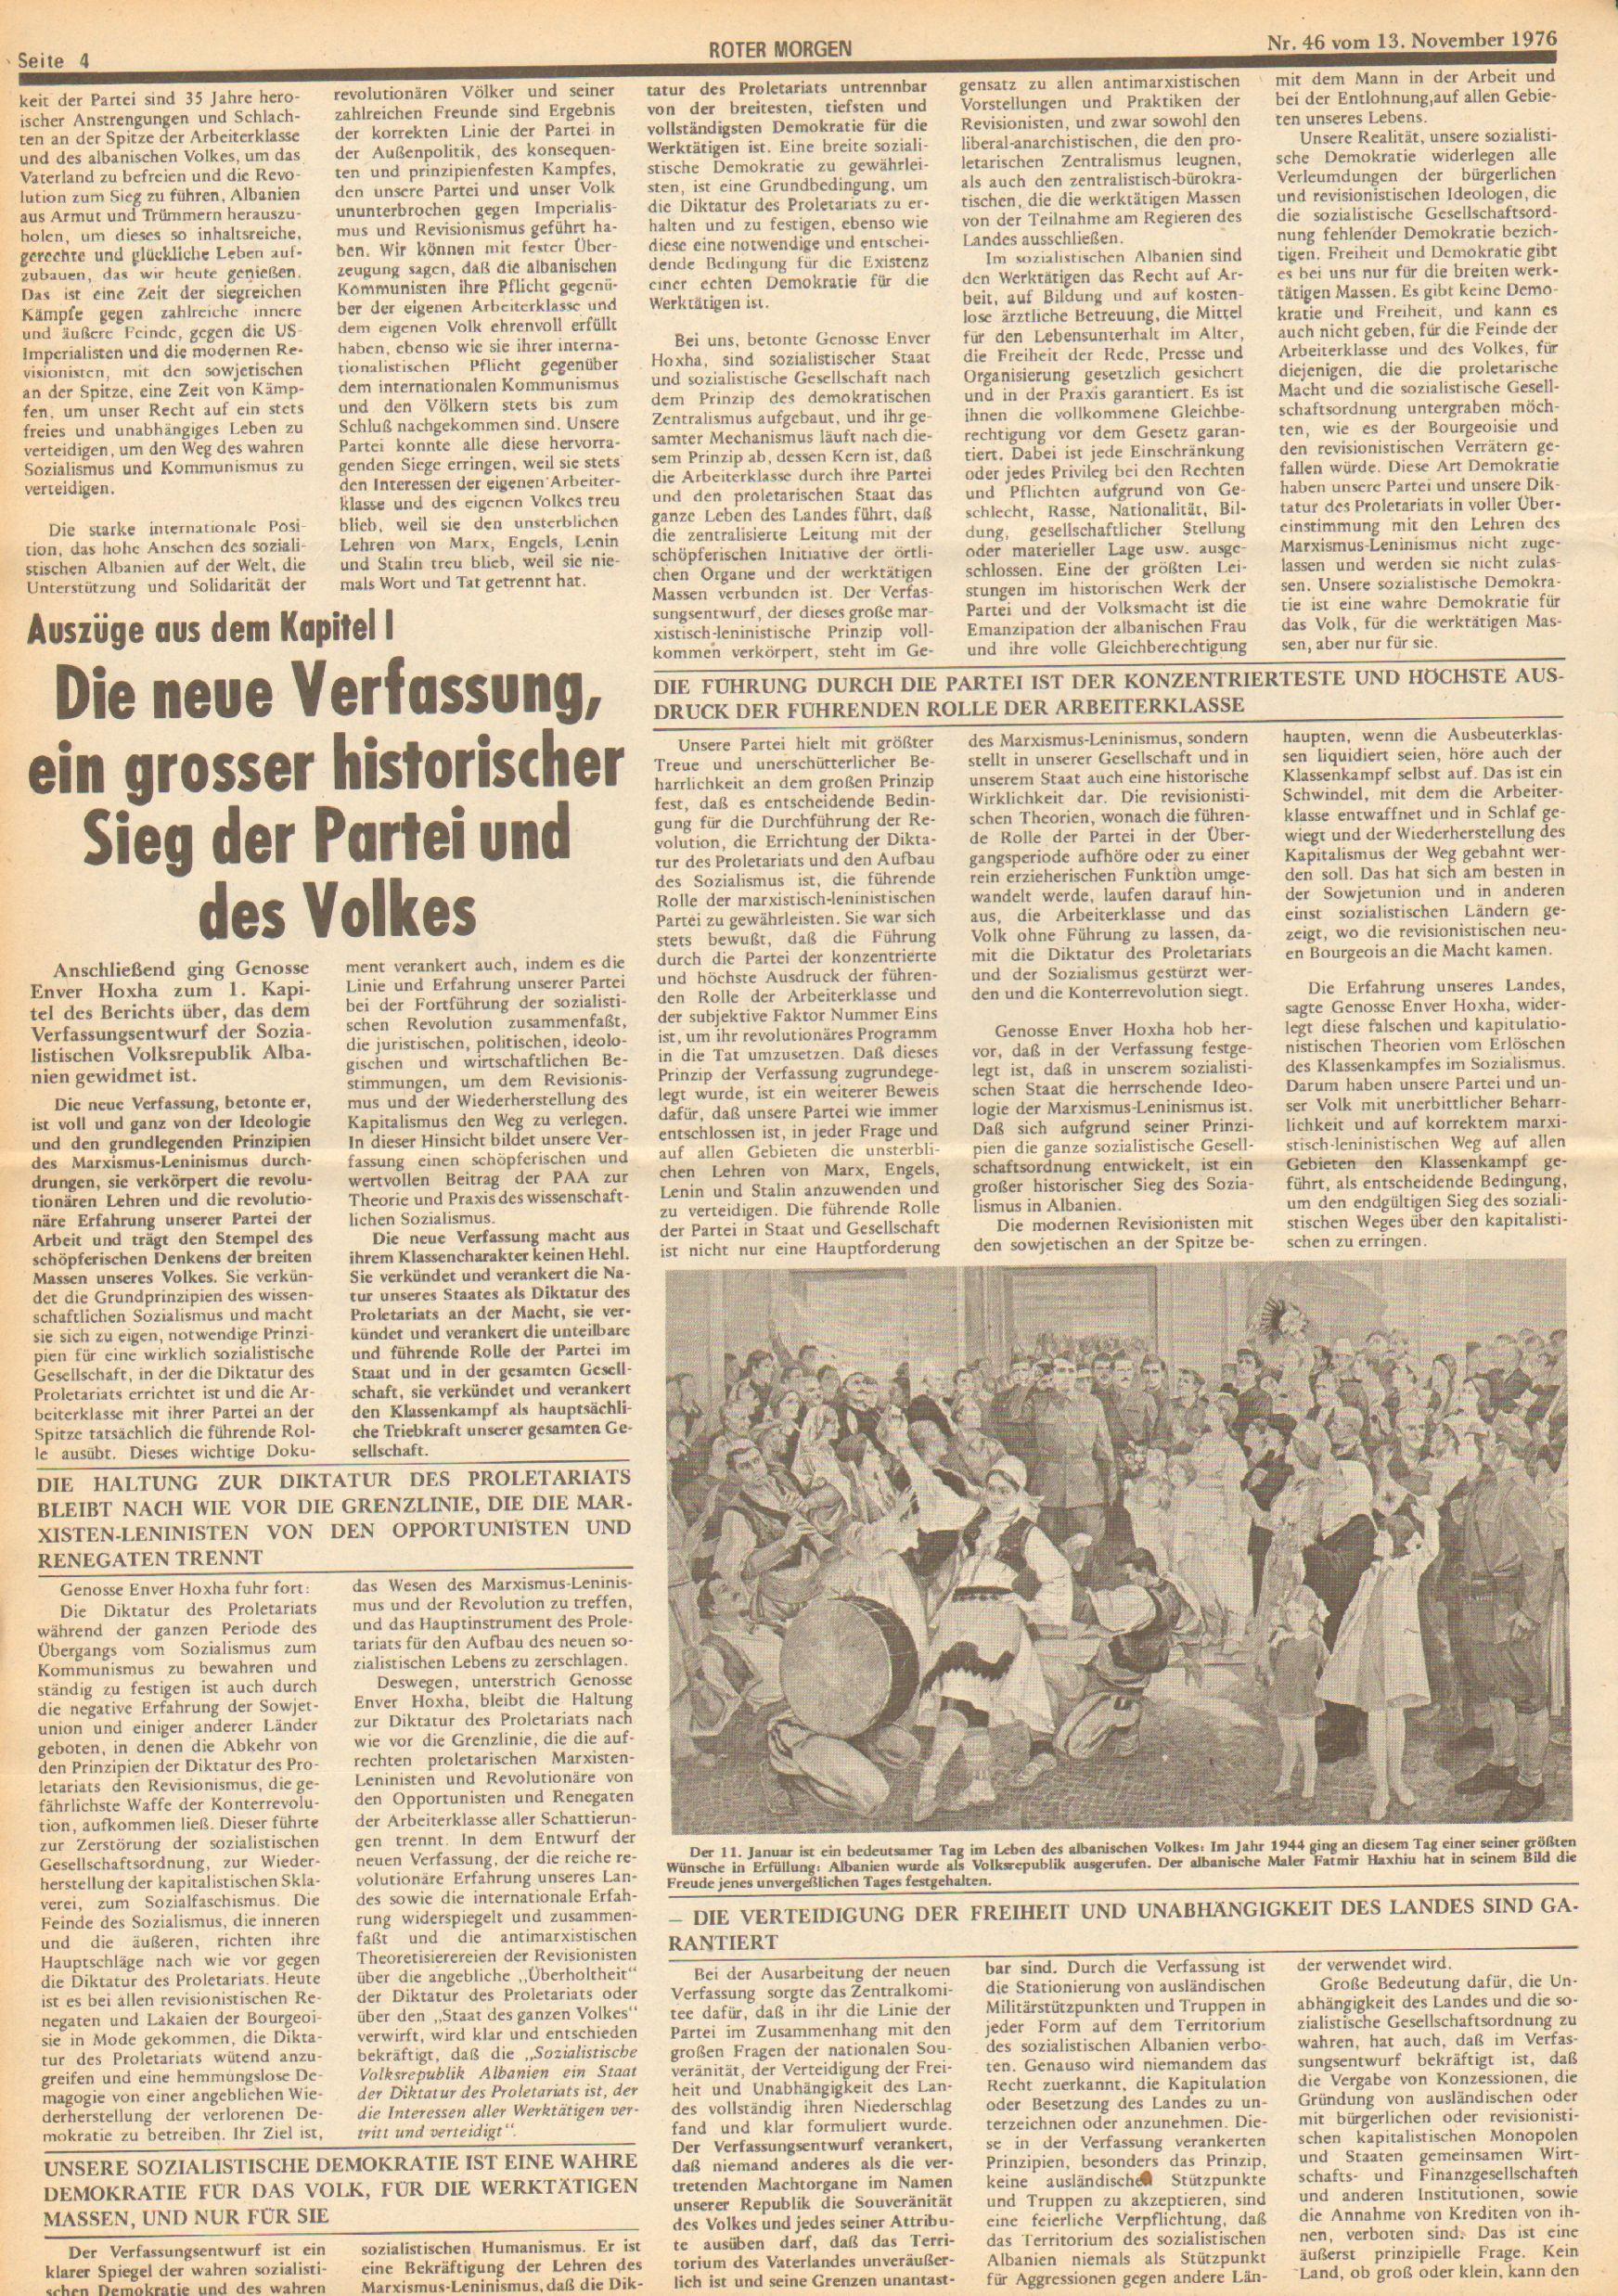 Roter Morgen, 10. Jg., 13. November 1976, Nr. 46, Seite 4